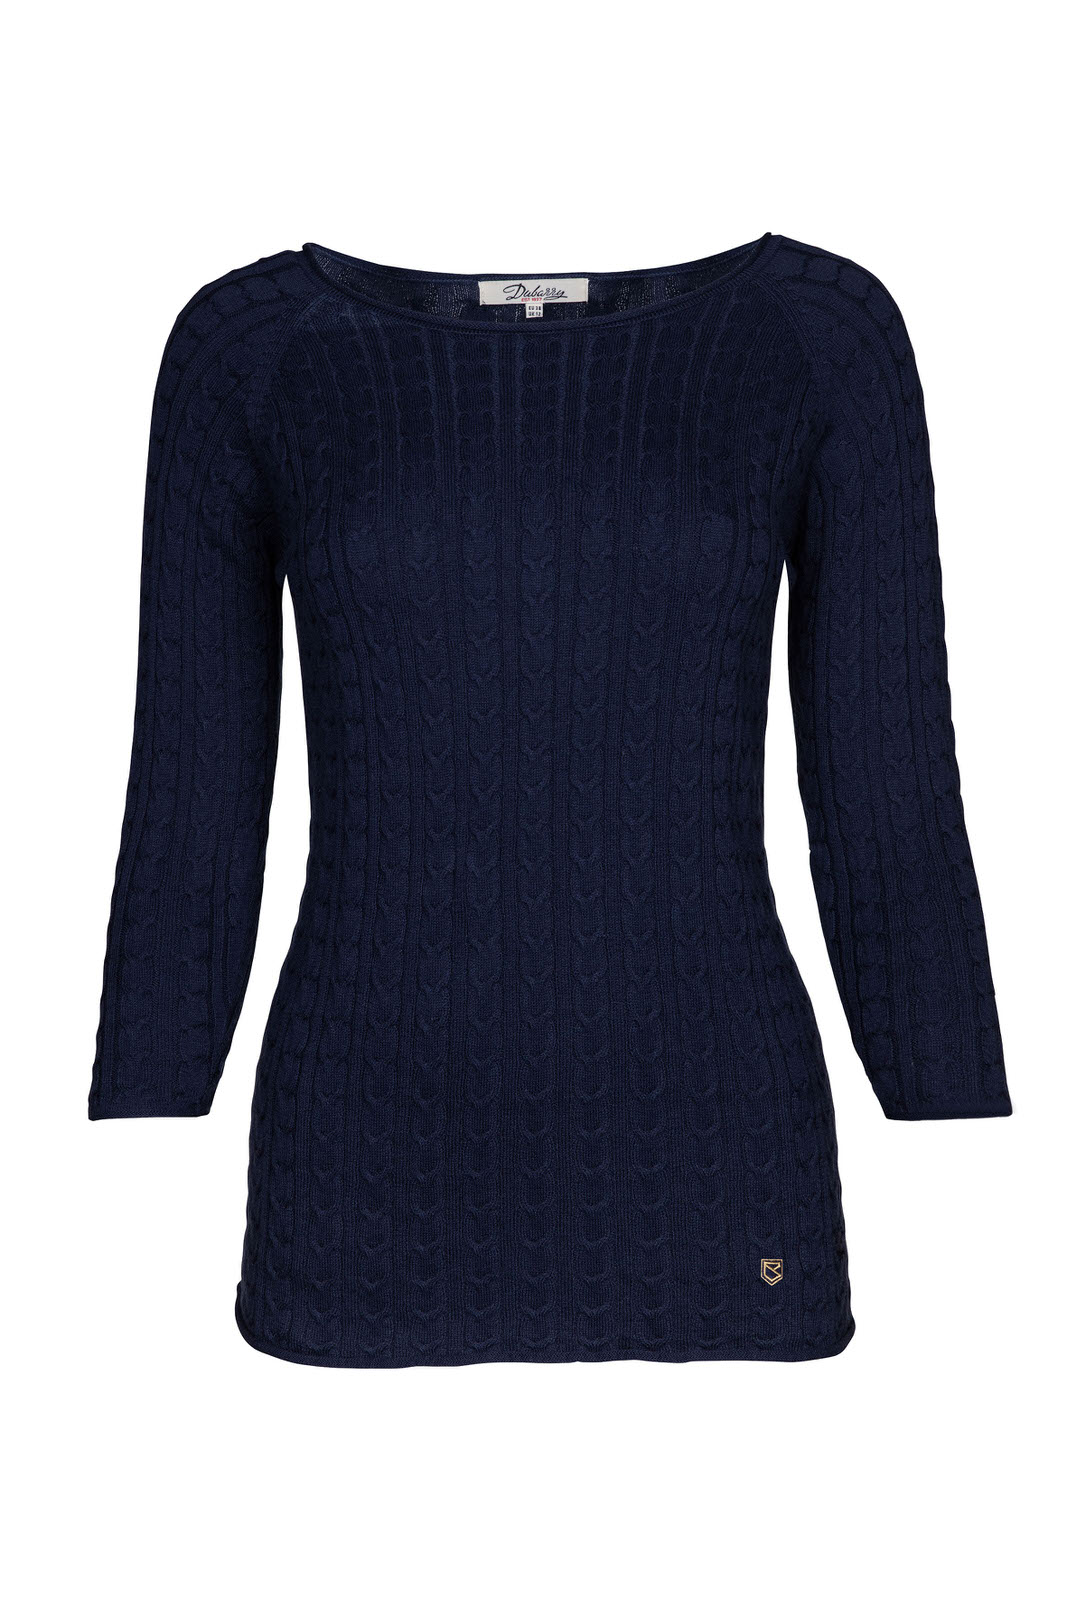 Caltra Sweater - Navy